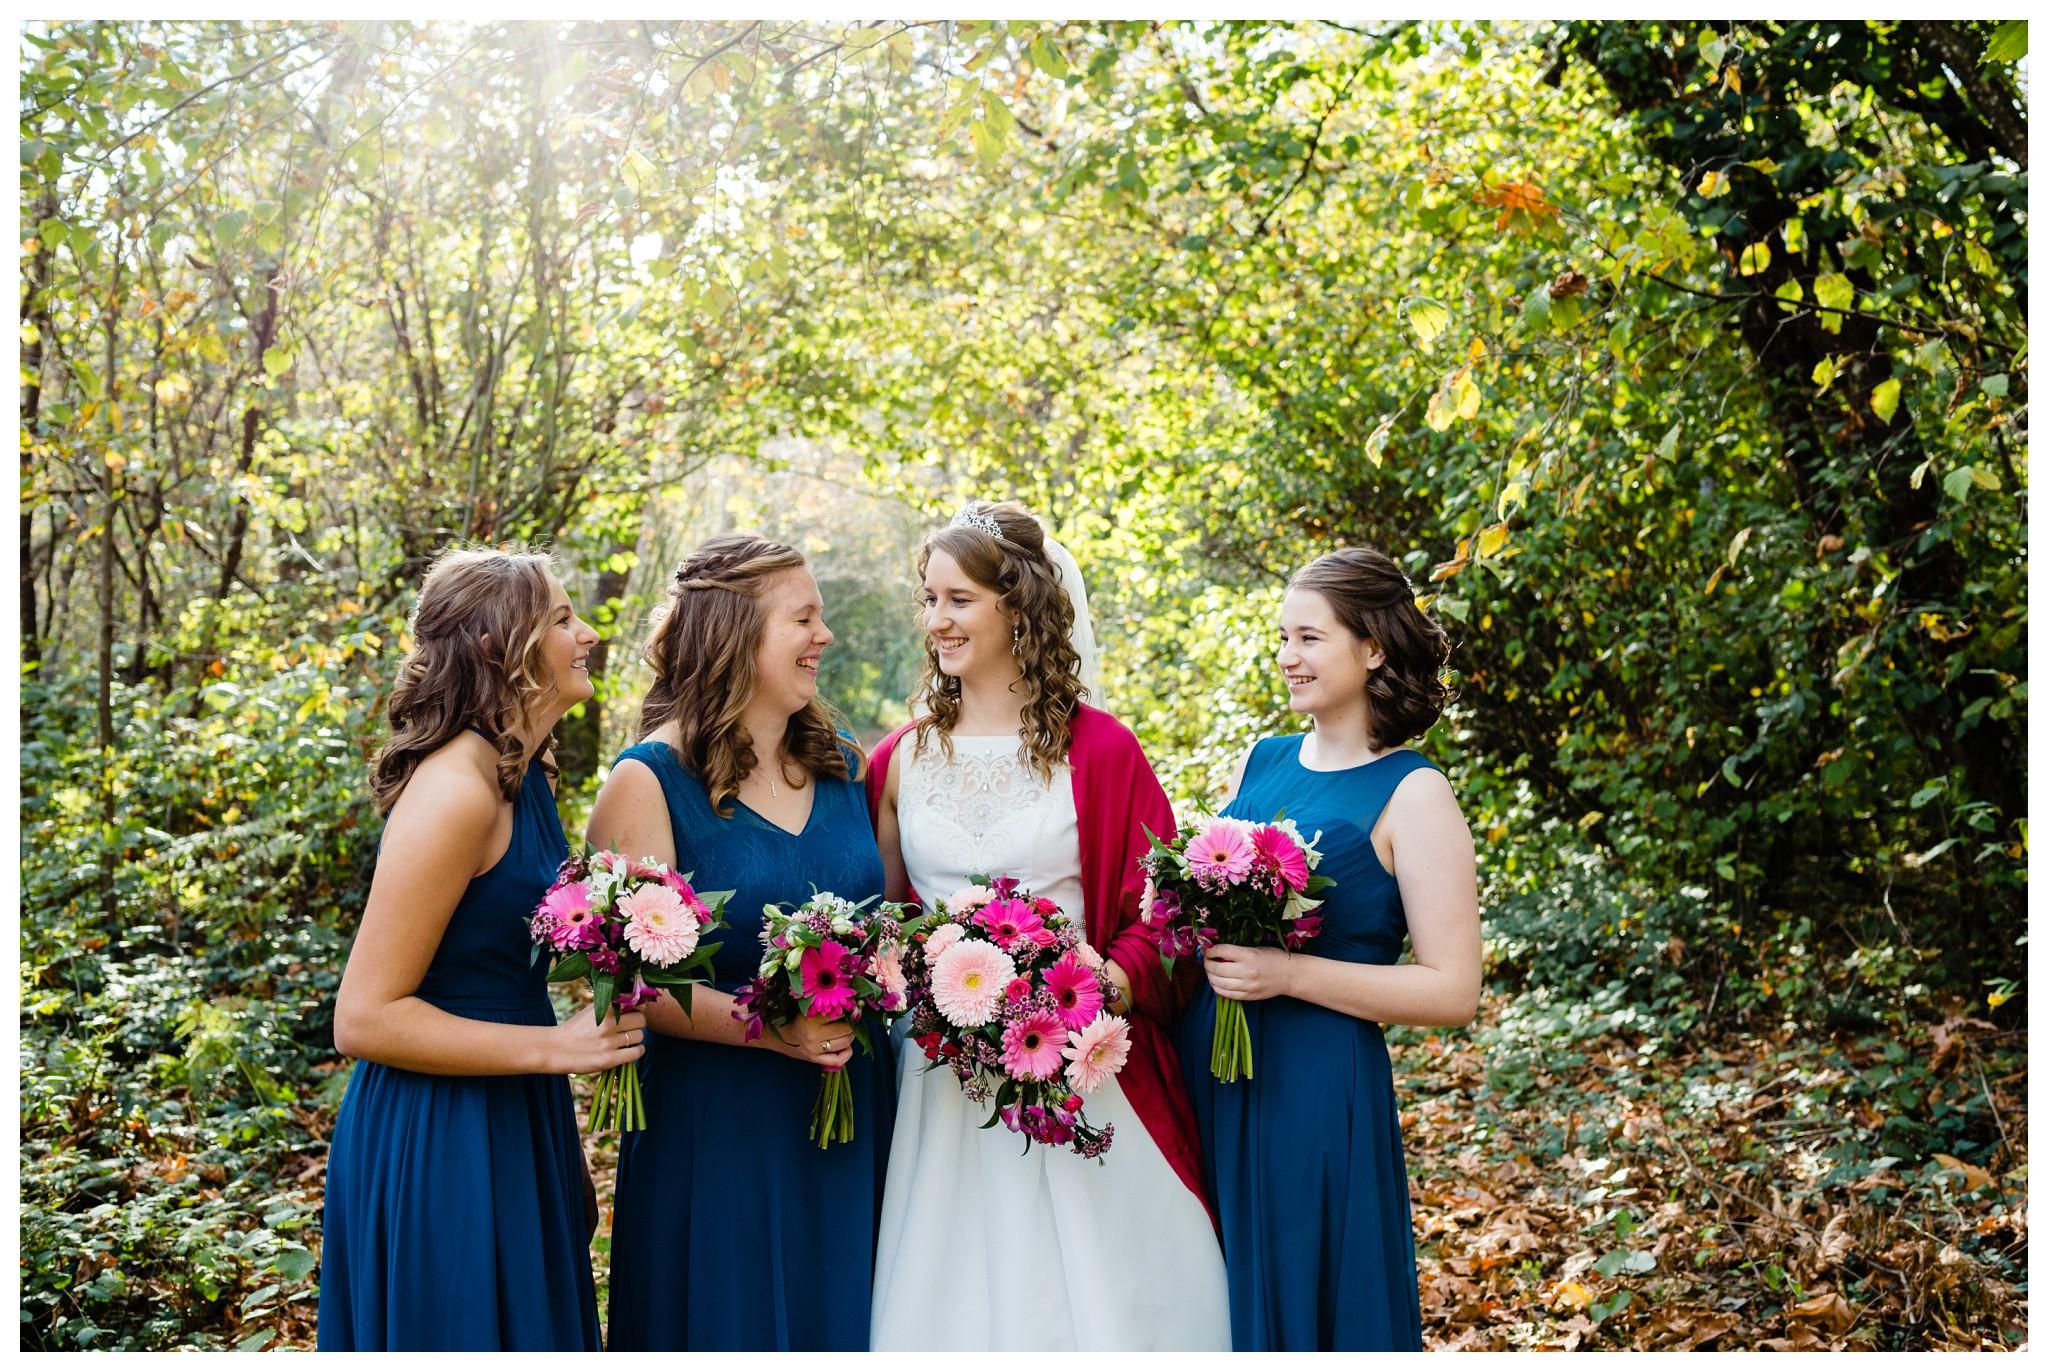 Aldergrove Park Christian Church Wedding Photography Pink Flowers Blue Bridesmaid Dress Fall_0092.jpg